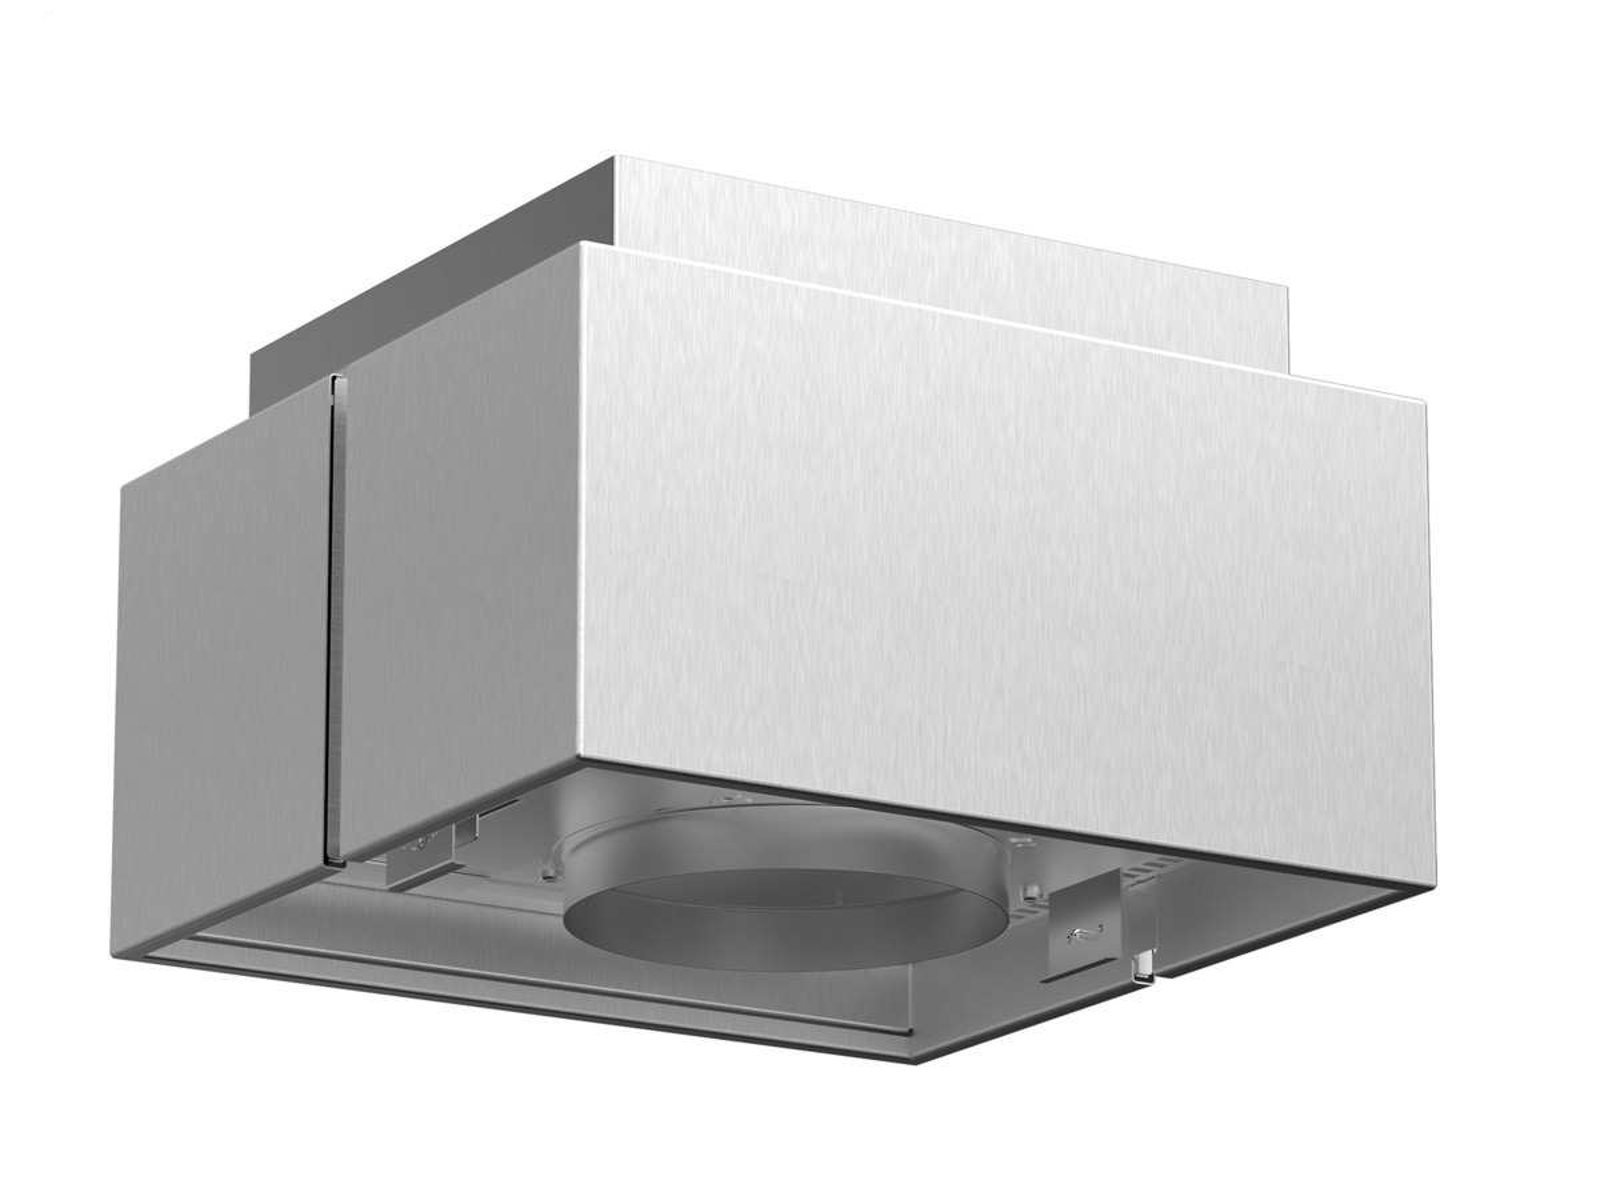 siemens lz57500 cleanair umluftkamin. Black Bedroom Furniture Sets. Home Design Ideas